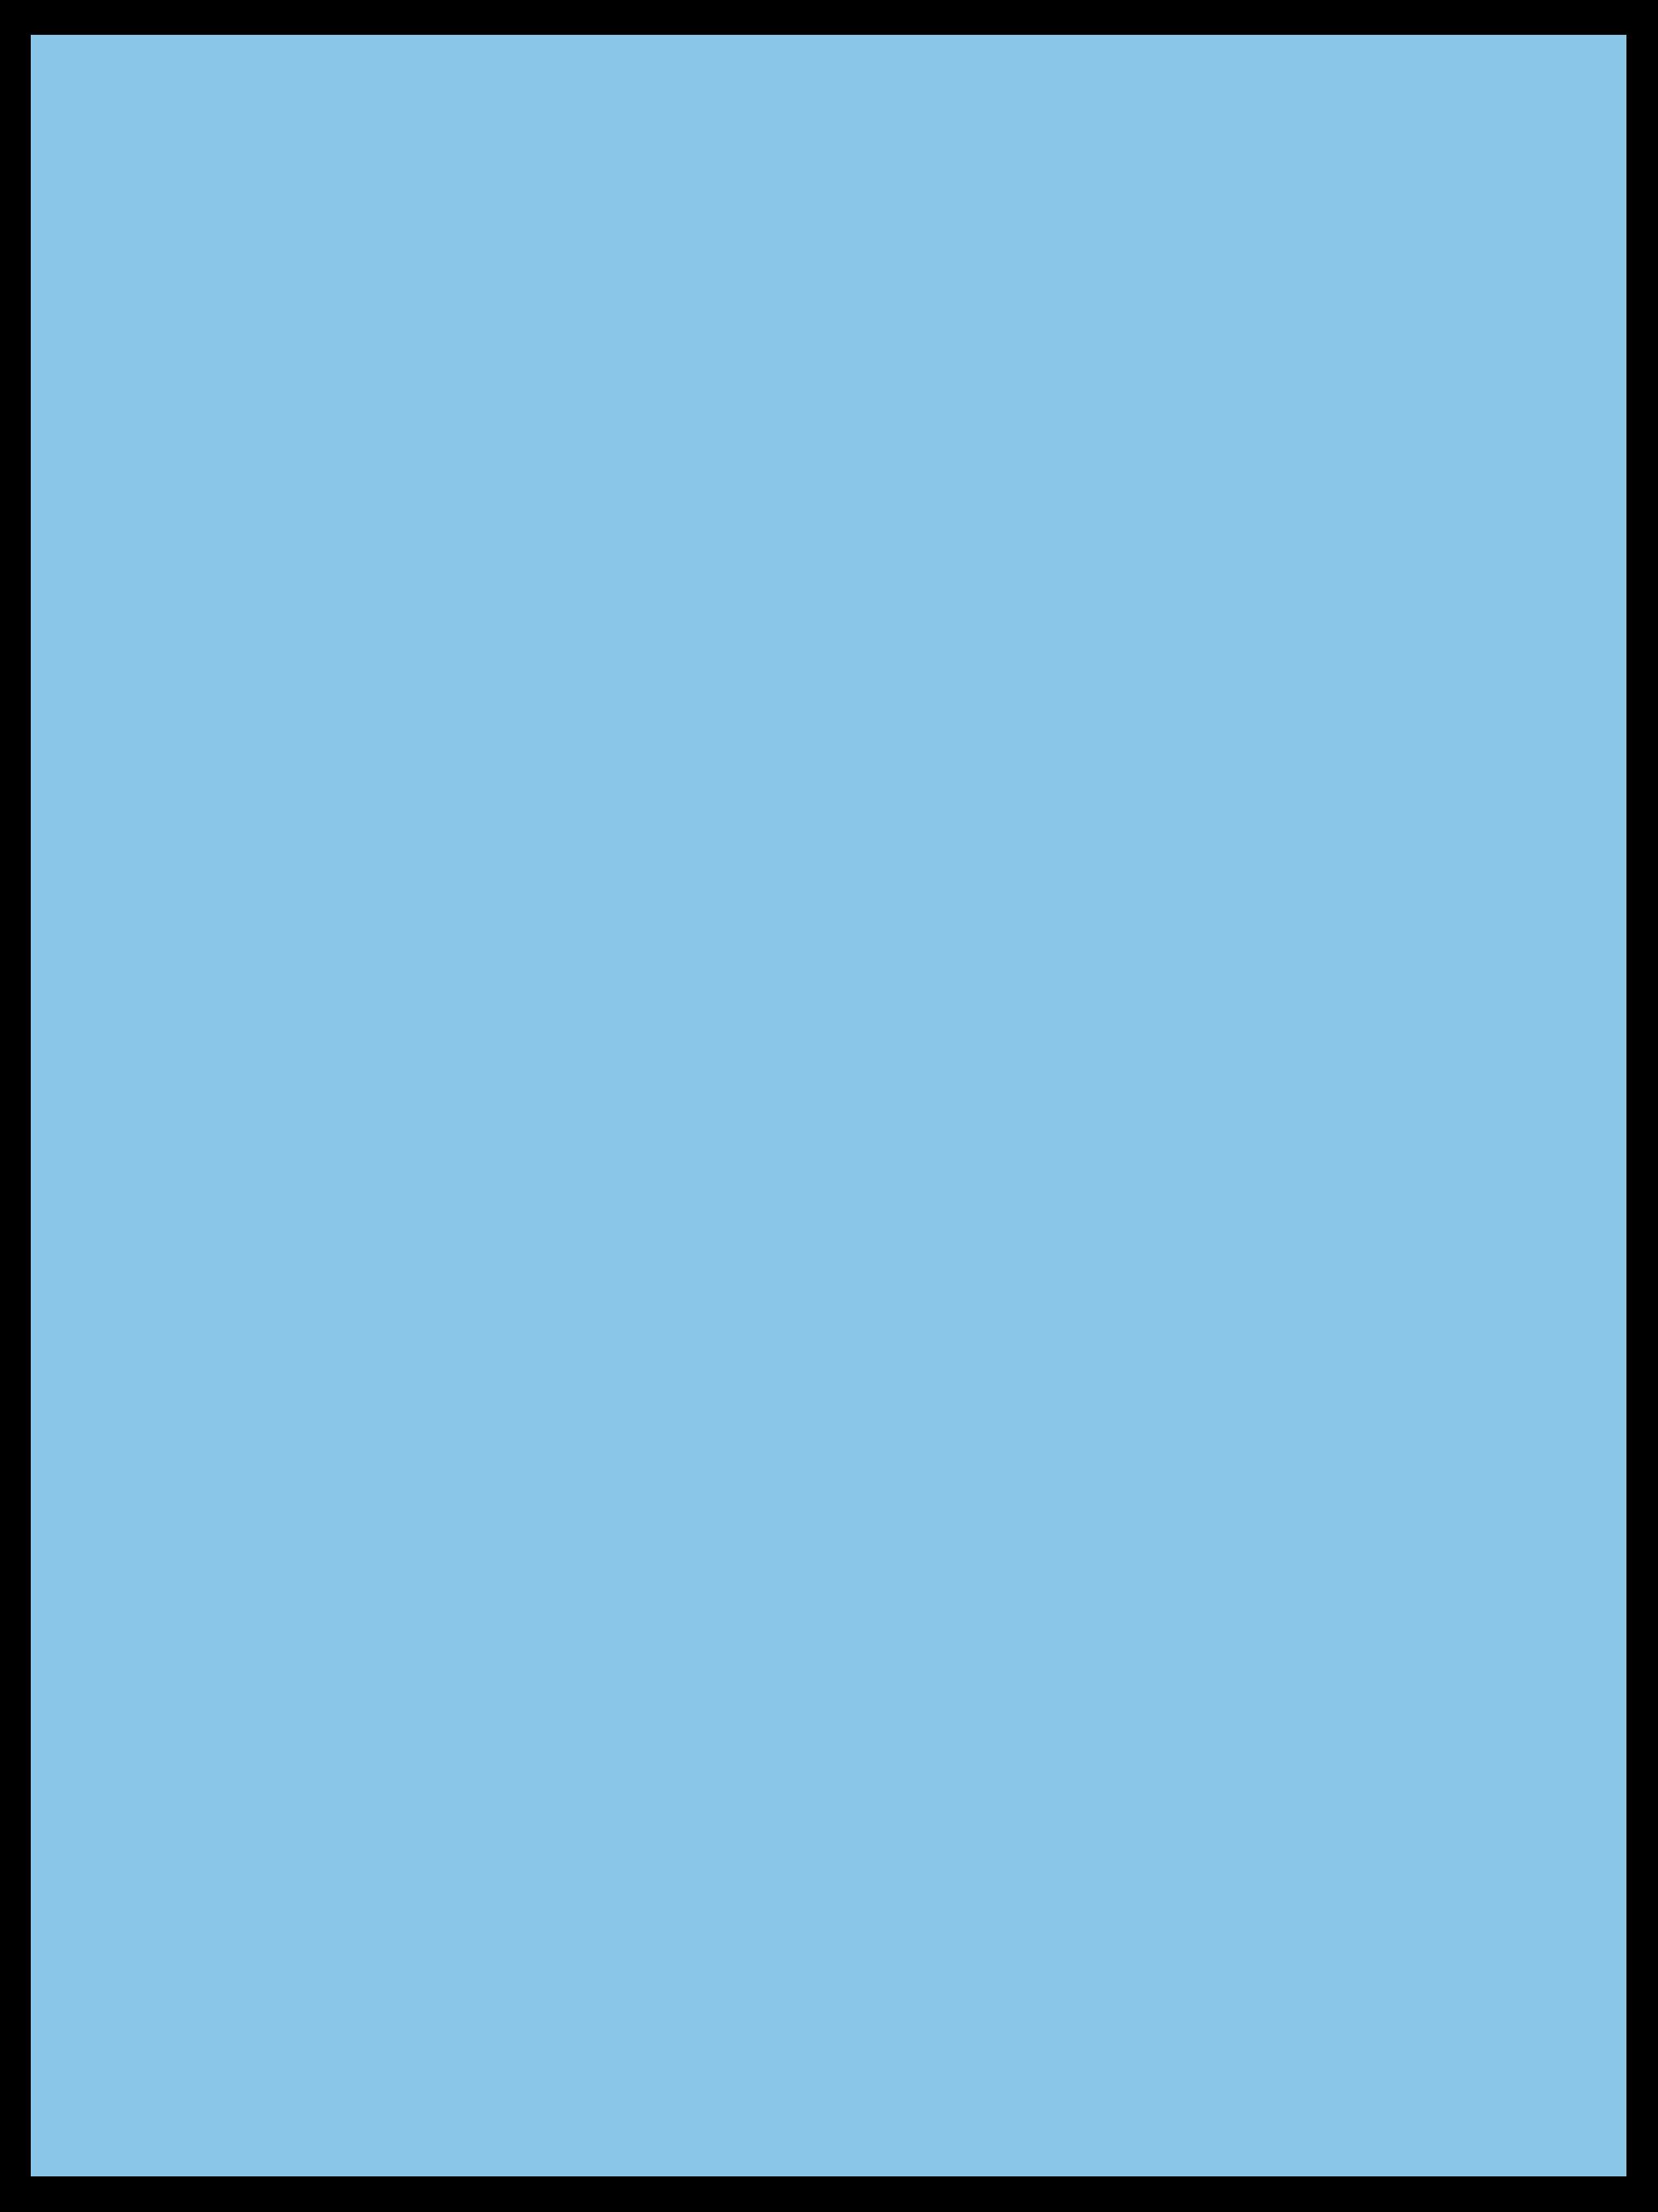 Ipad Vertical_2048x2732_Stars_Blue.png